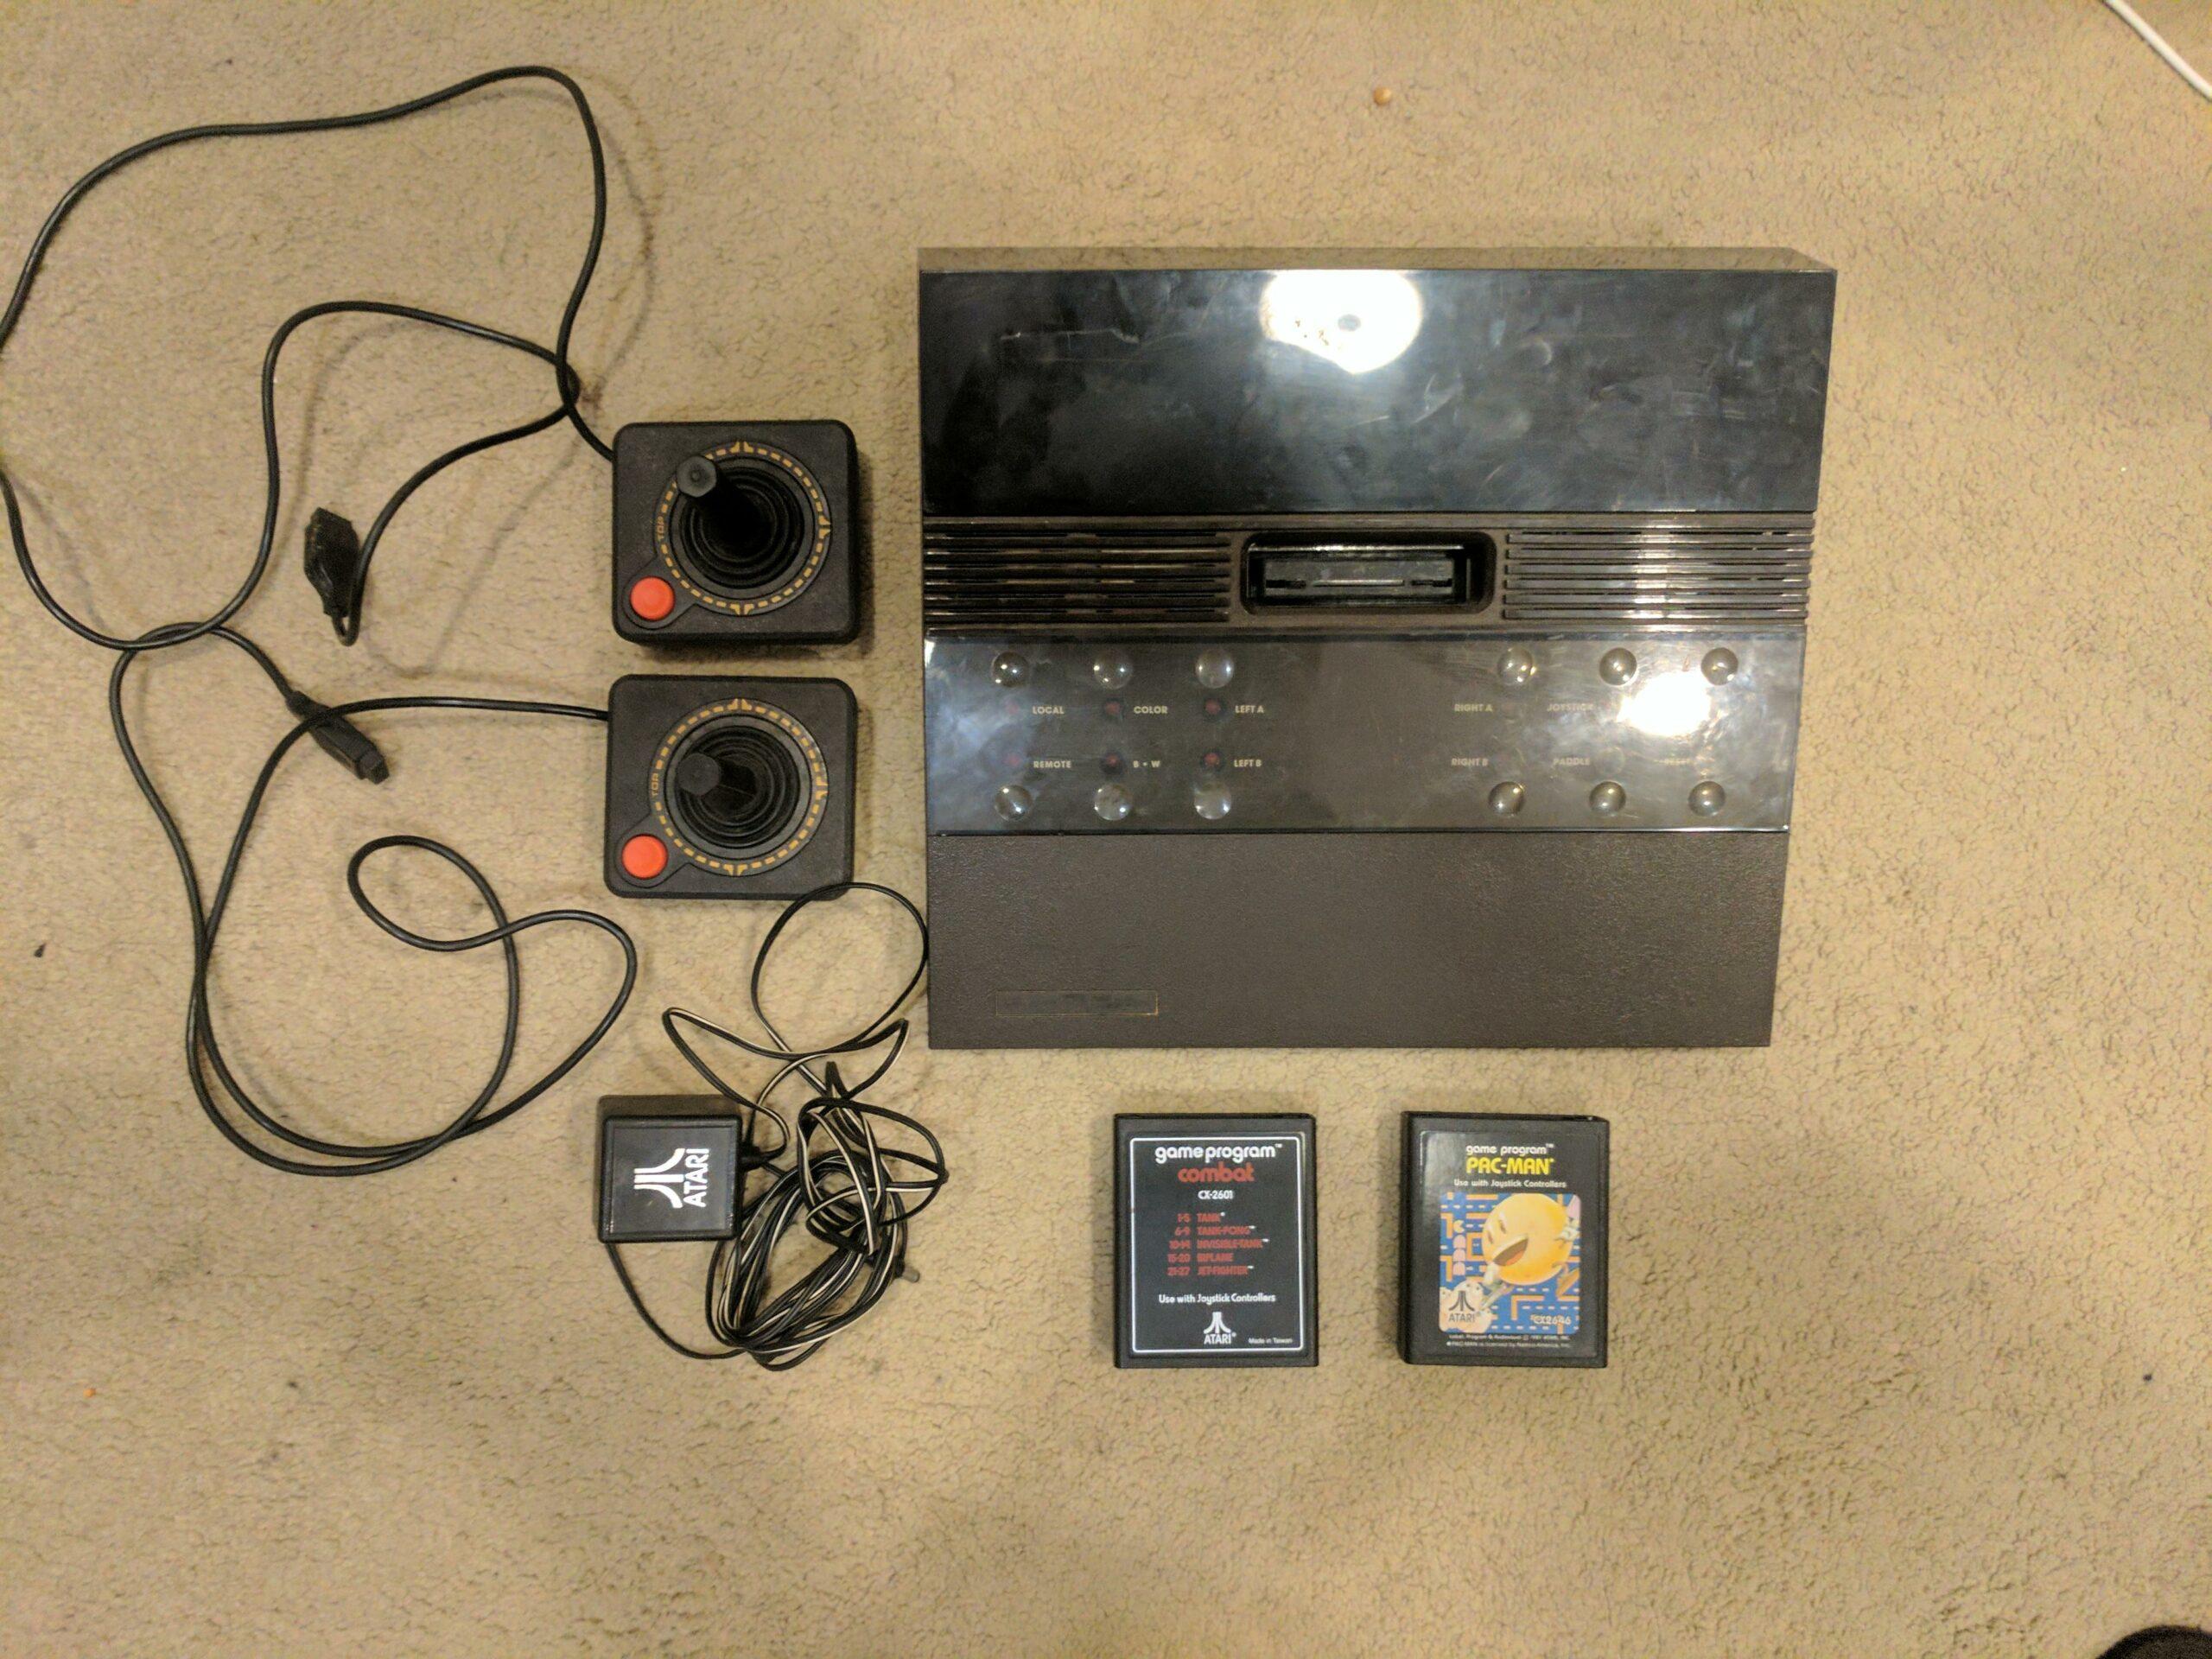 Man finds rare Atari 2700 prototype at thrift store